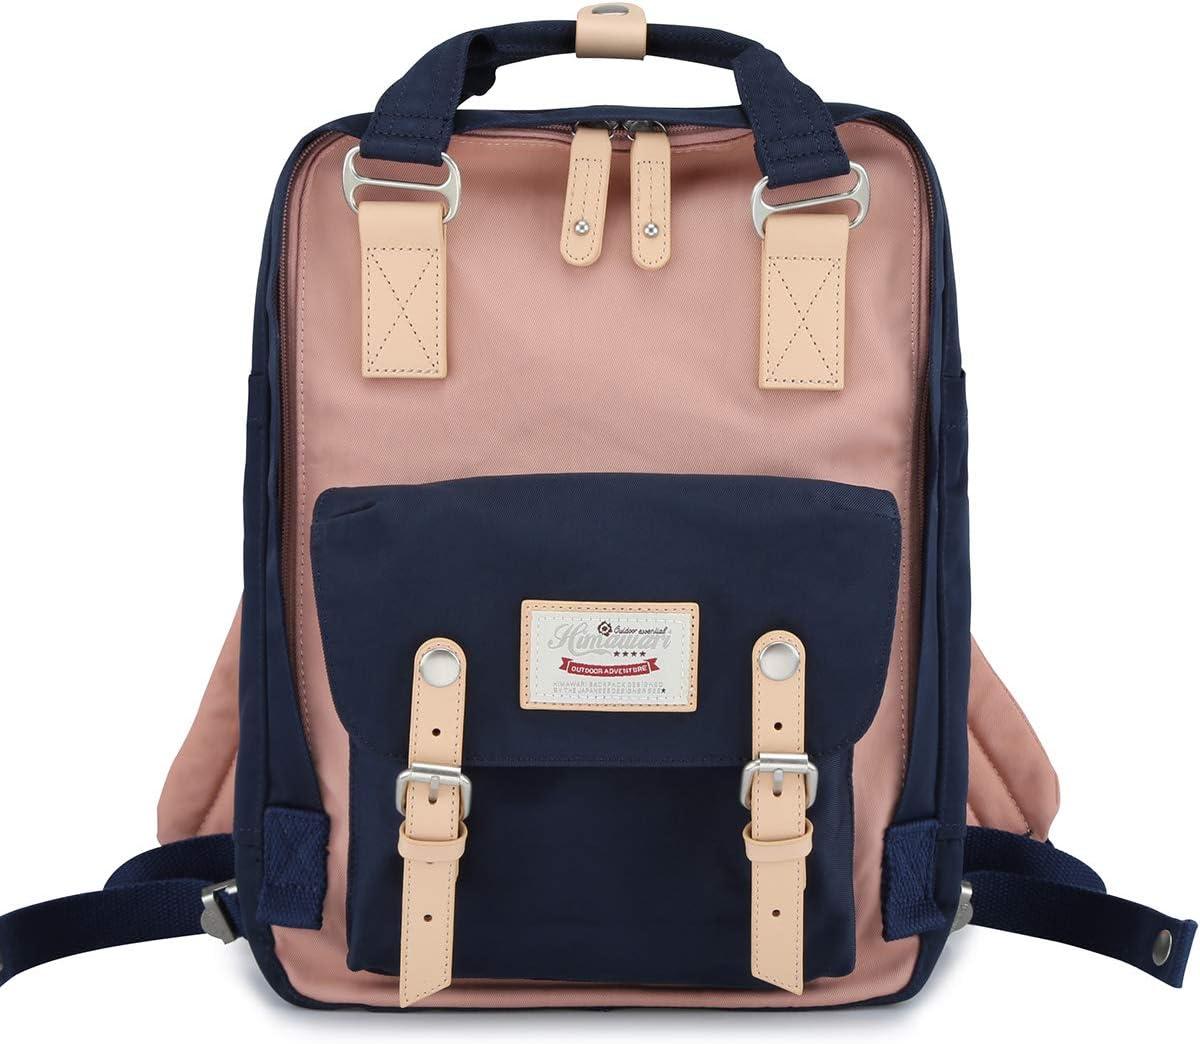 "Himawari Backpack Laptop Backpack College Backpack School Bag 14.9"" Travel Backpack for Women,Fits 13-inch Laptop(HM-54#)"